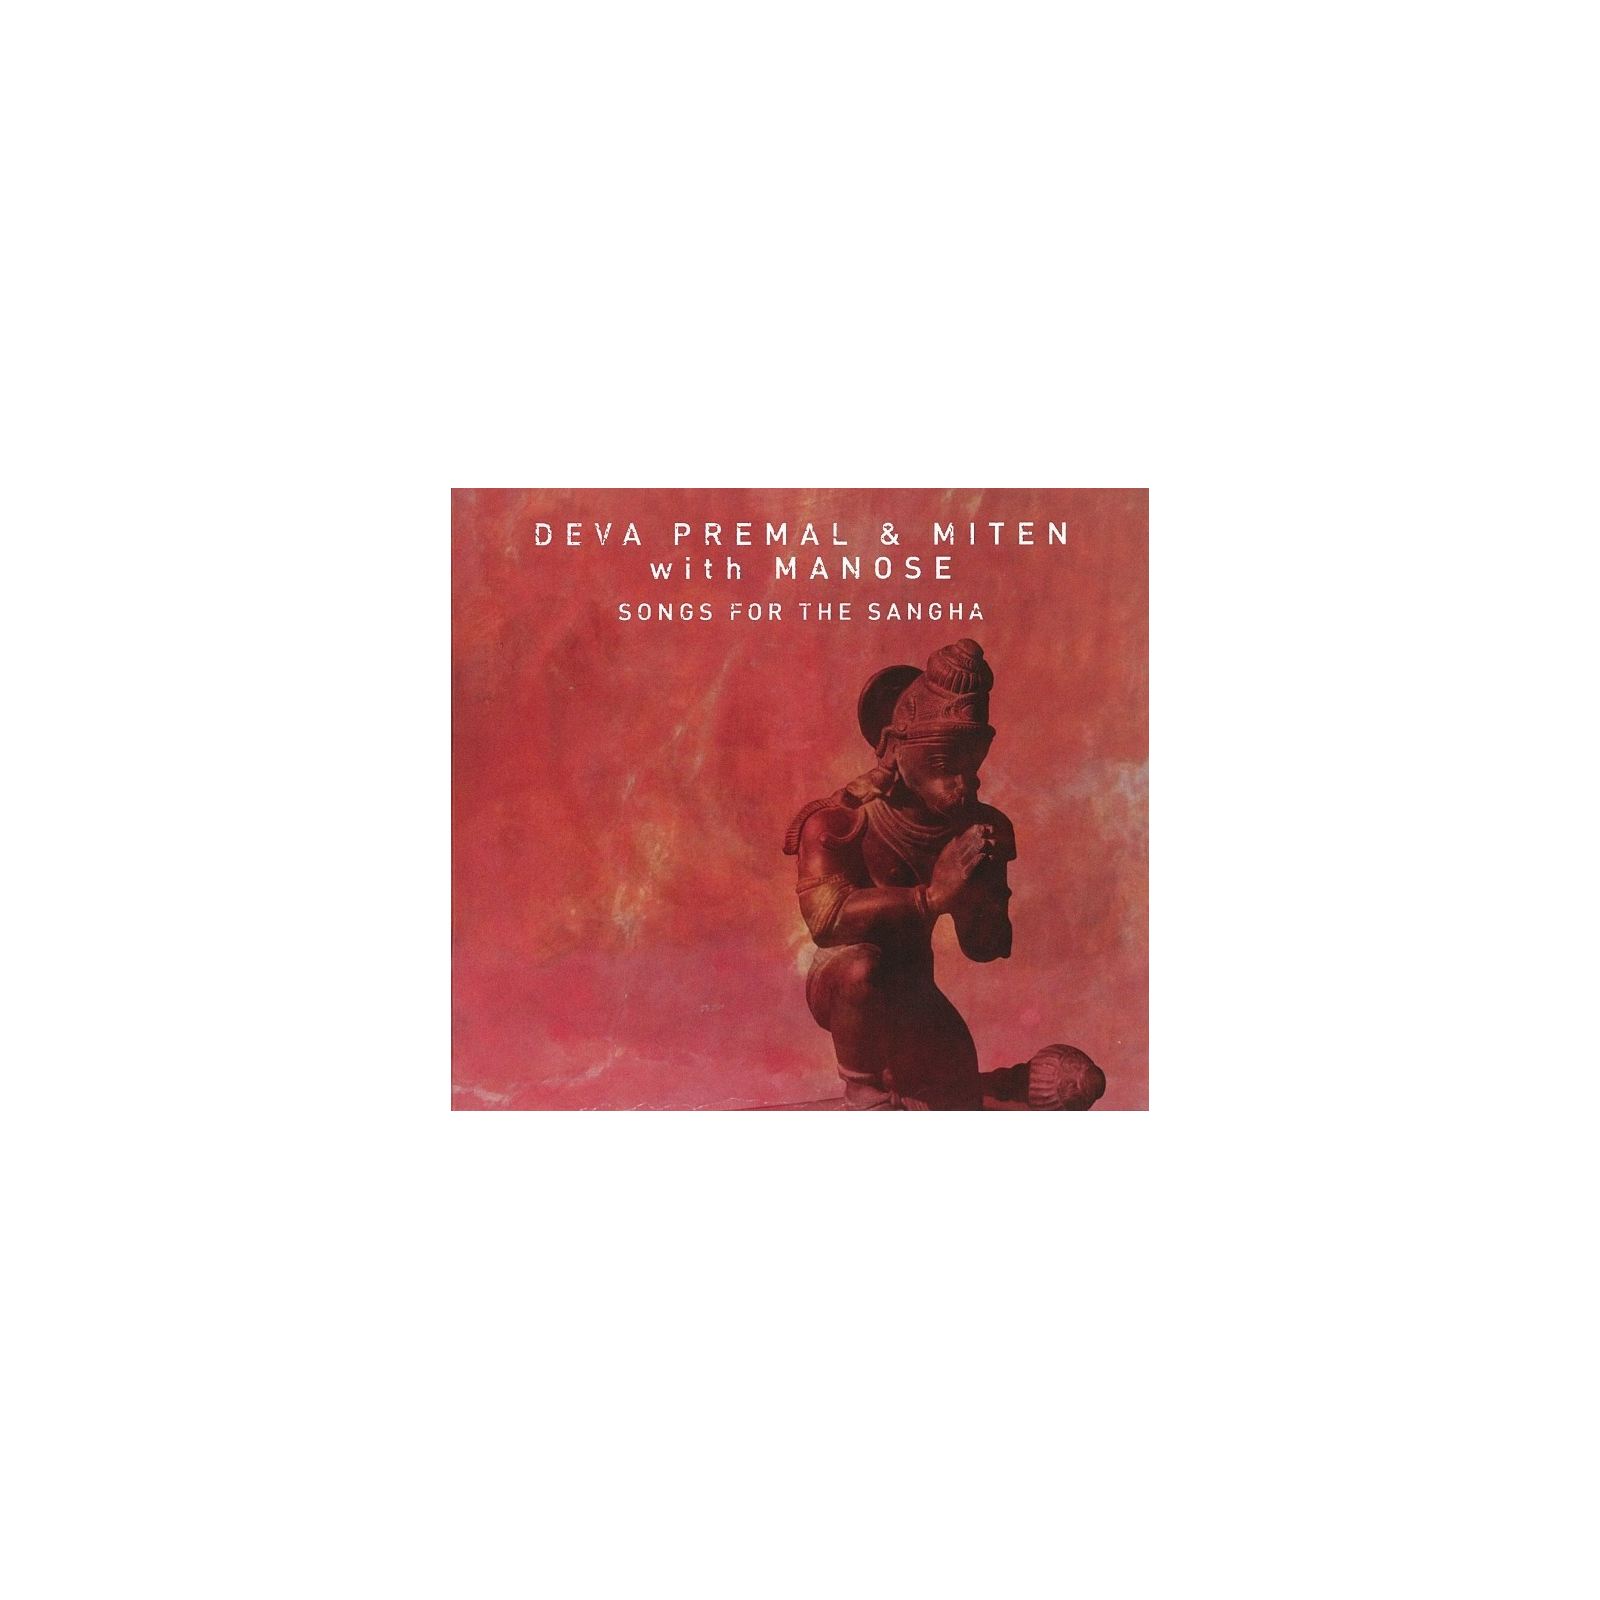 Songs for the Sangha